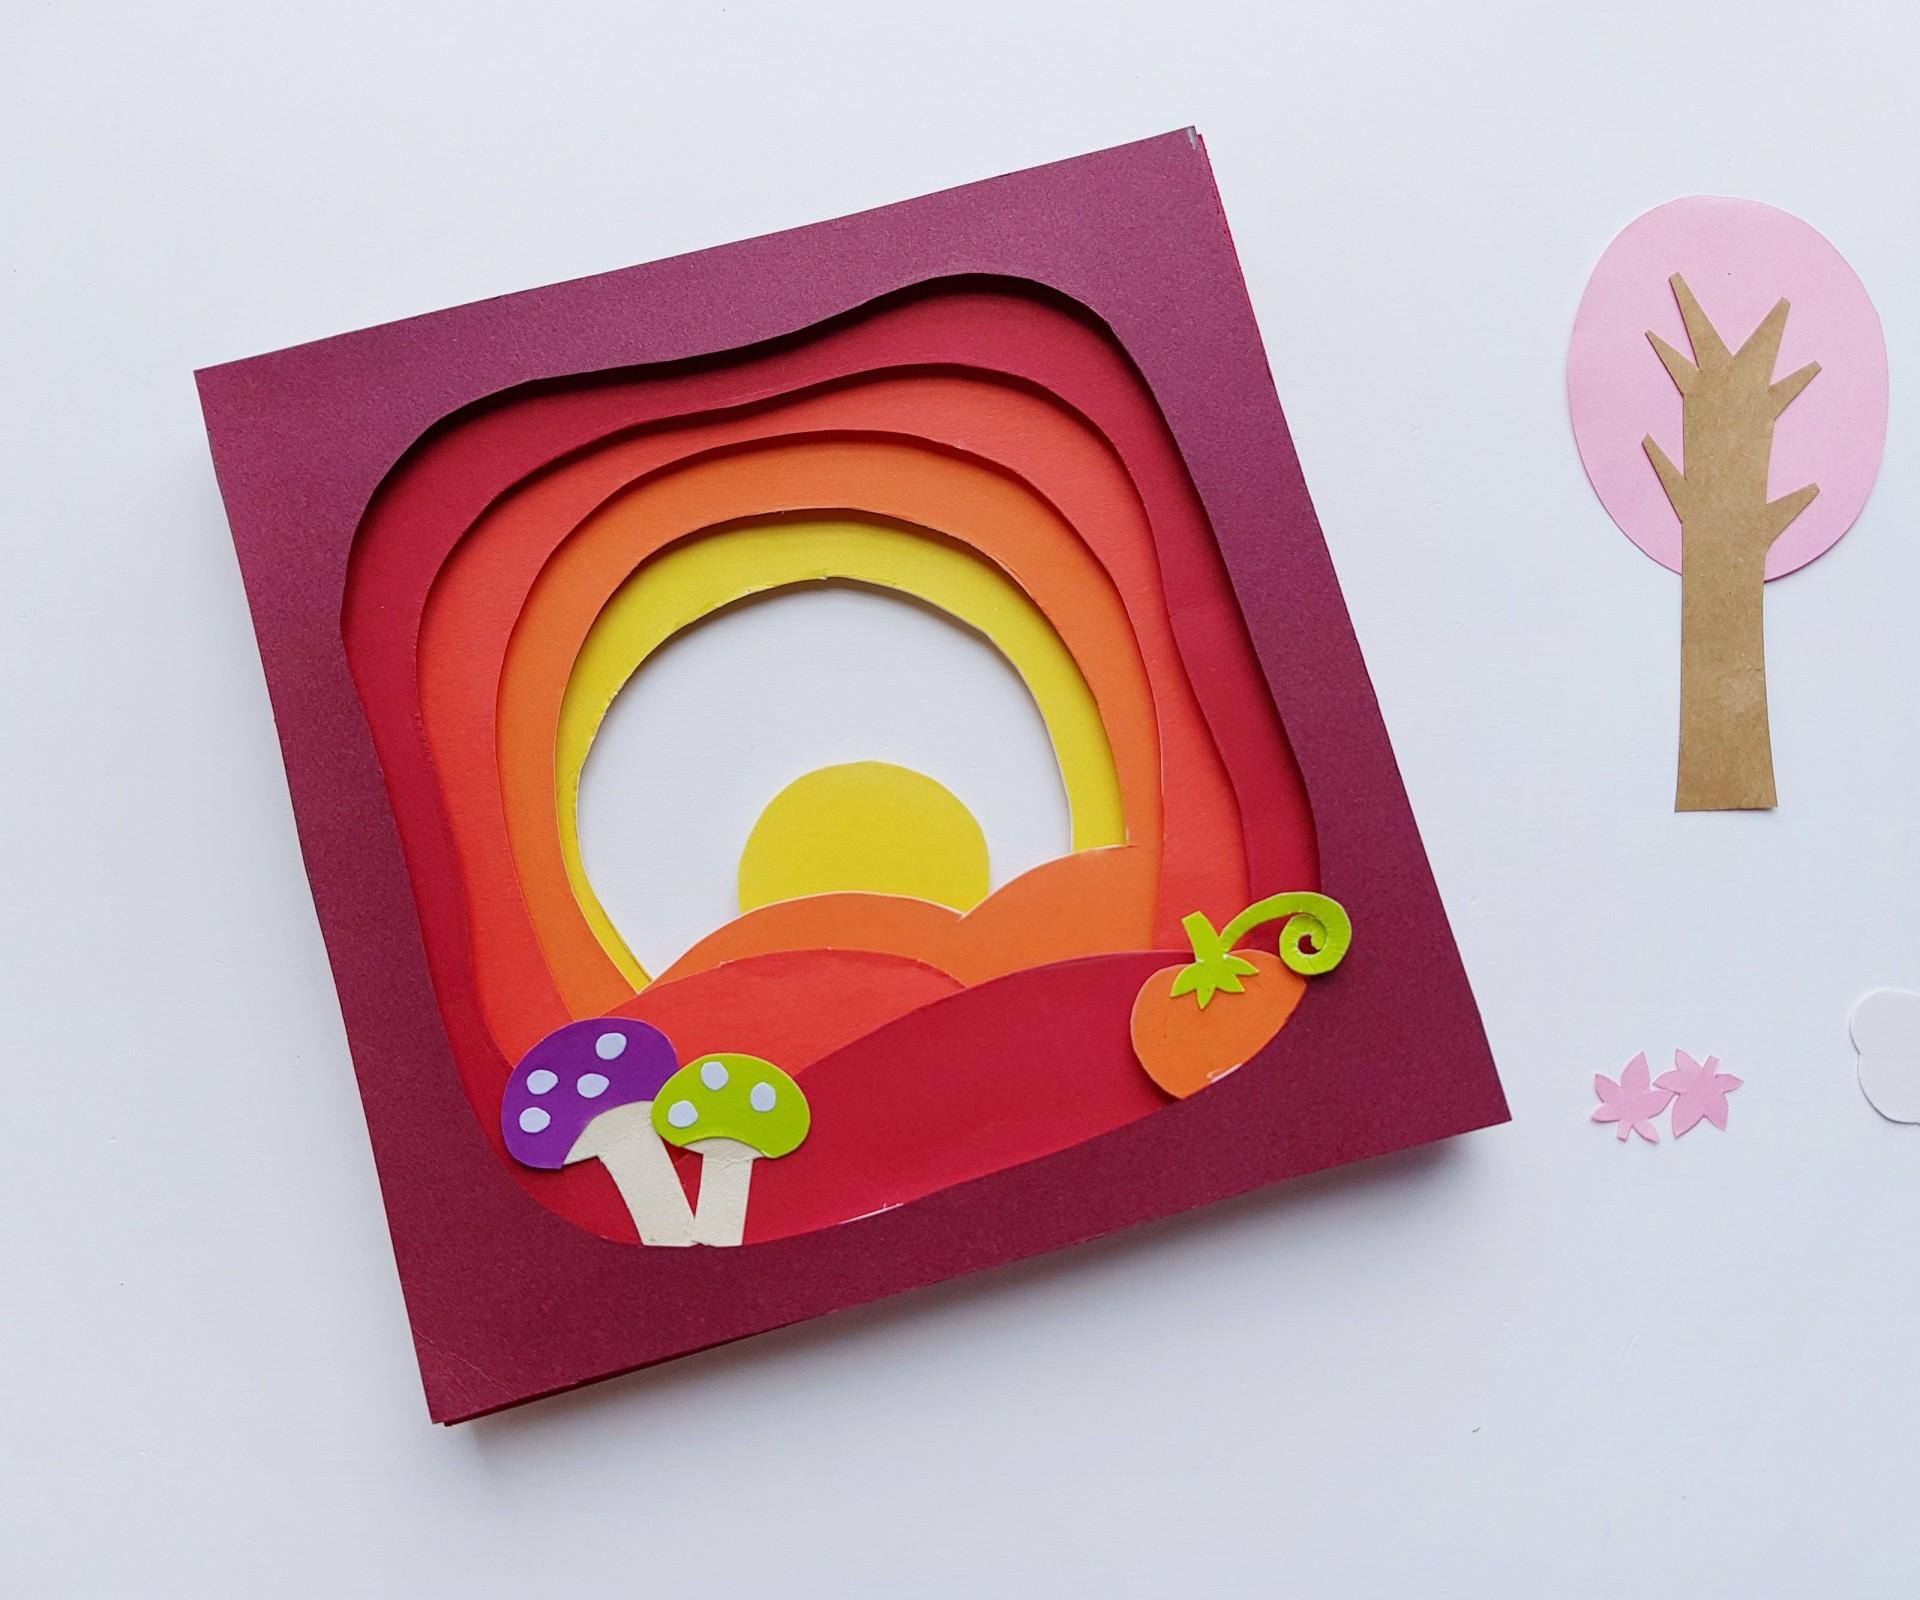 009 Surprising 3d Paper Art Template Inspiration  Templates Pdf1920